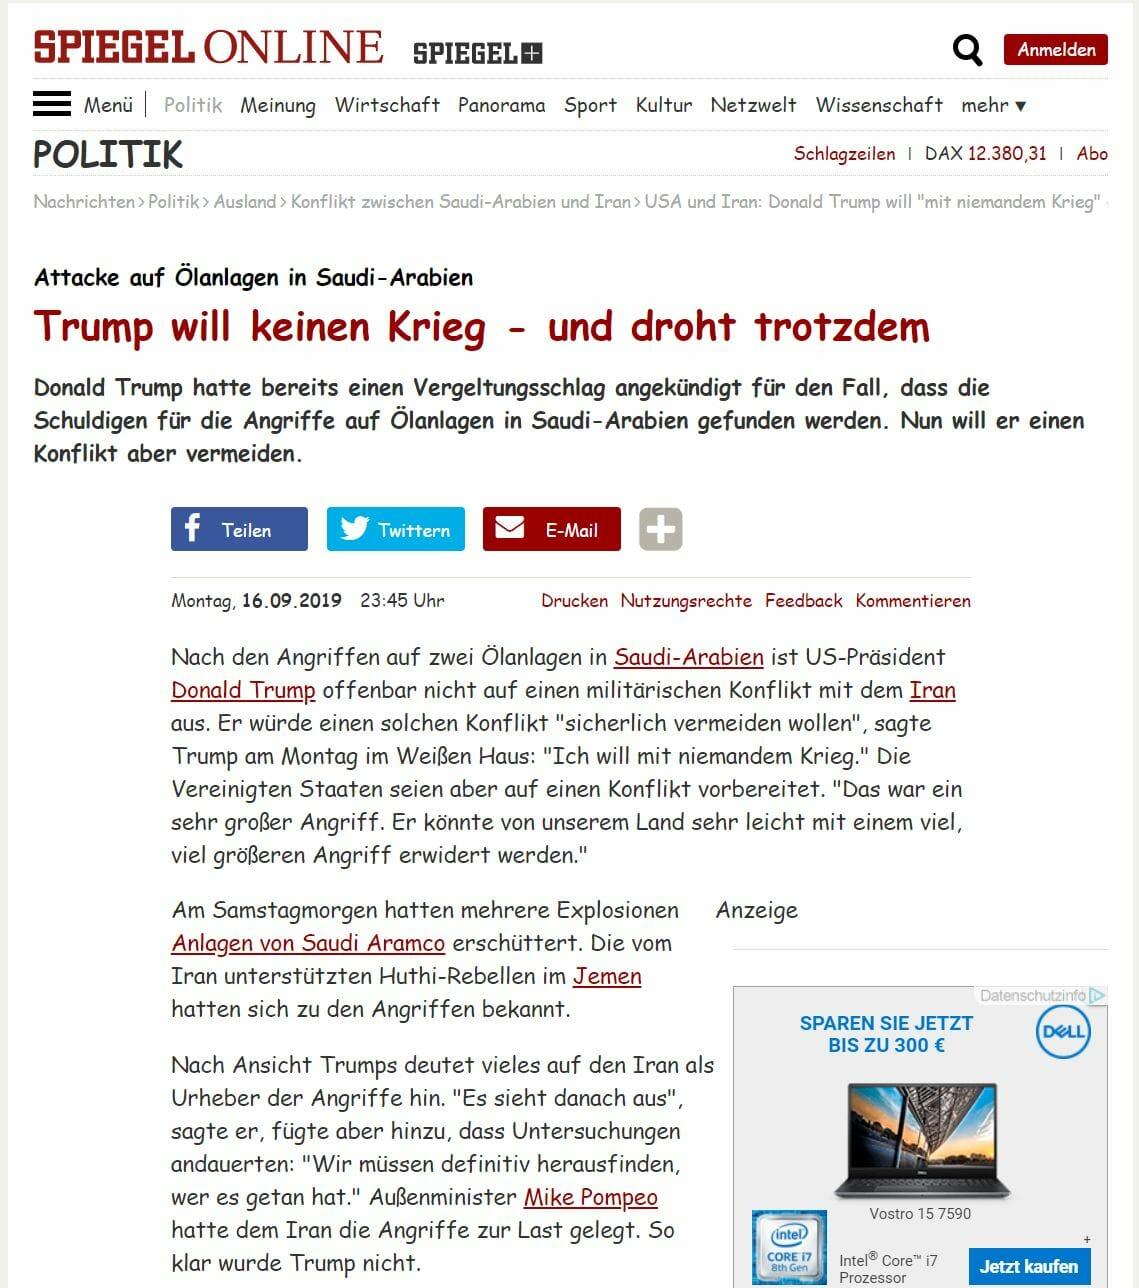 Spiegel Online Artikel Comic Sans MS